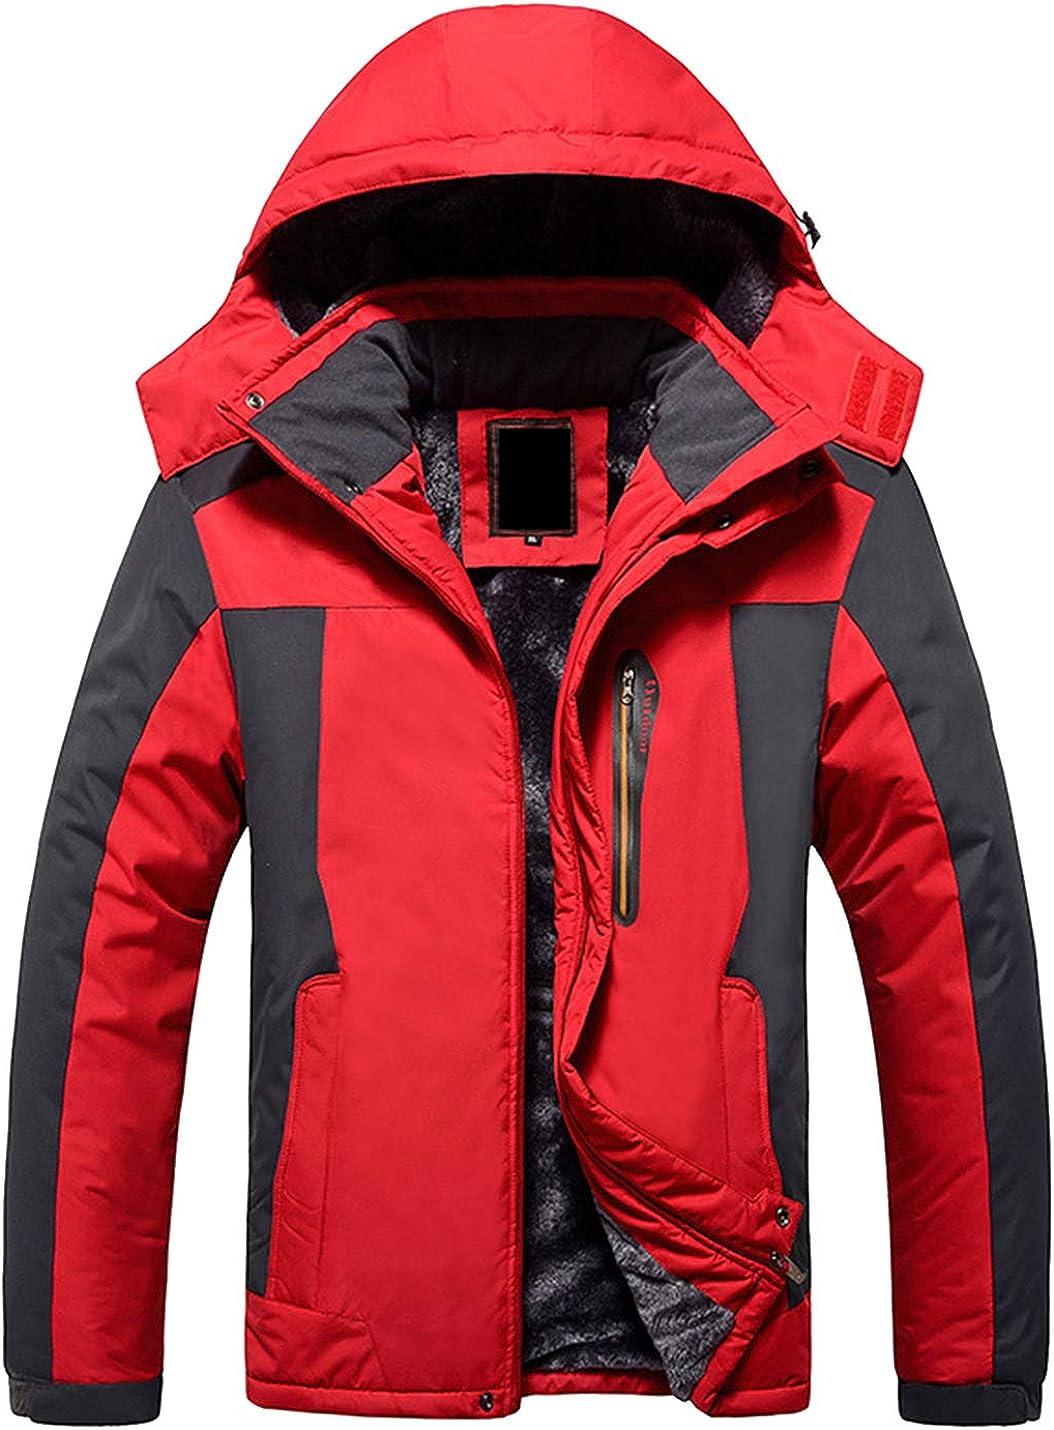 Uaneo Men's Casual Detachable Hood Fleece Lined Outdoor Mountain Hiking Jackets(Red-S)